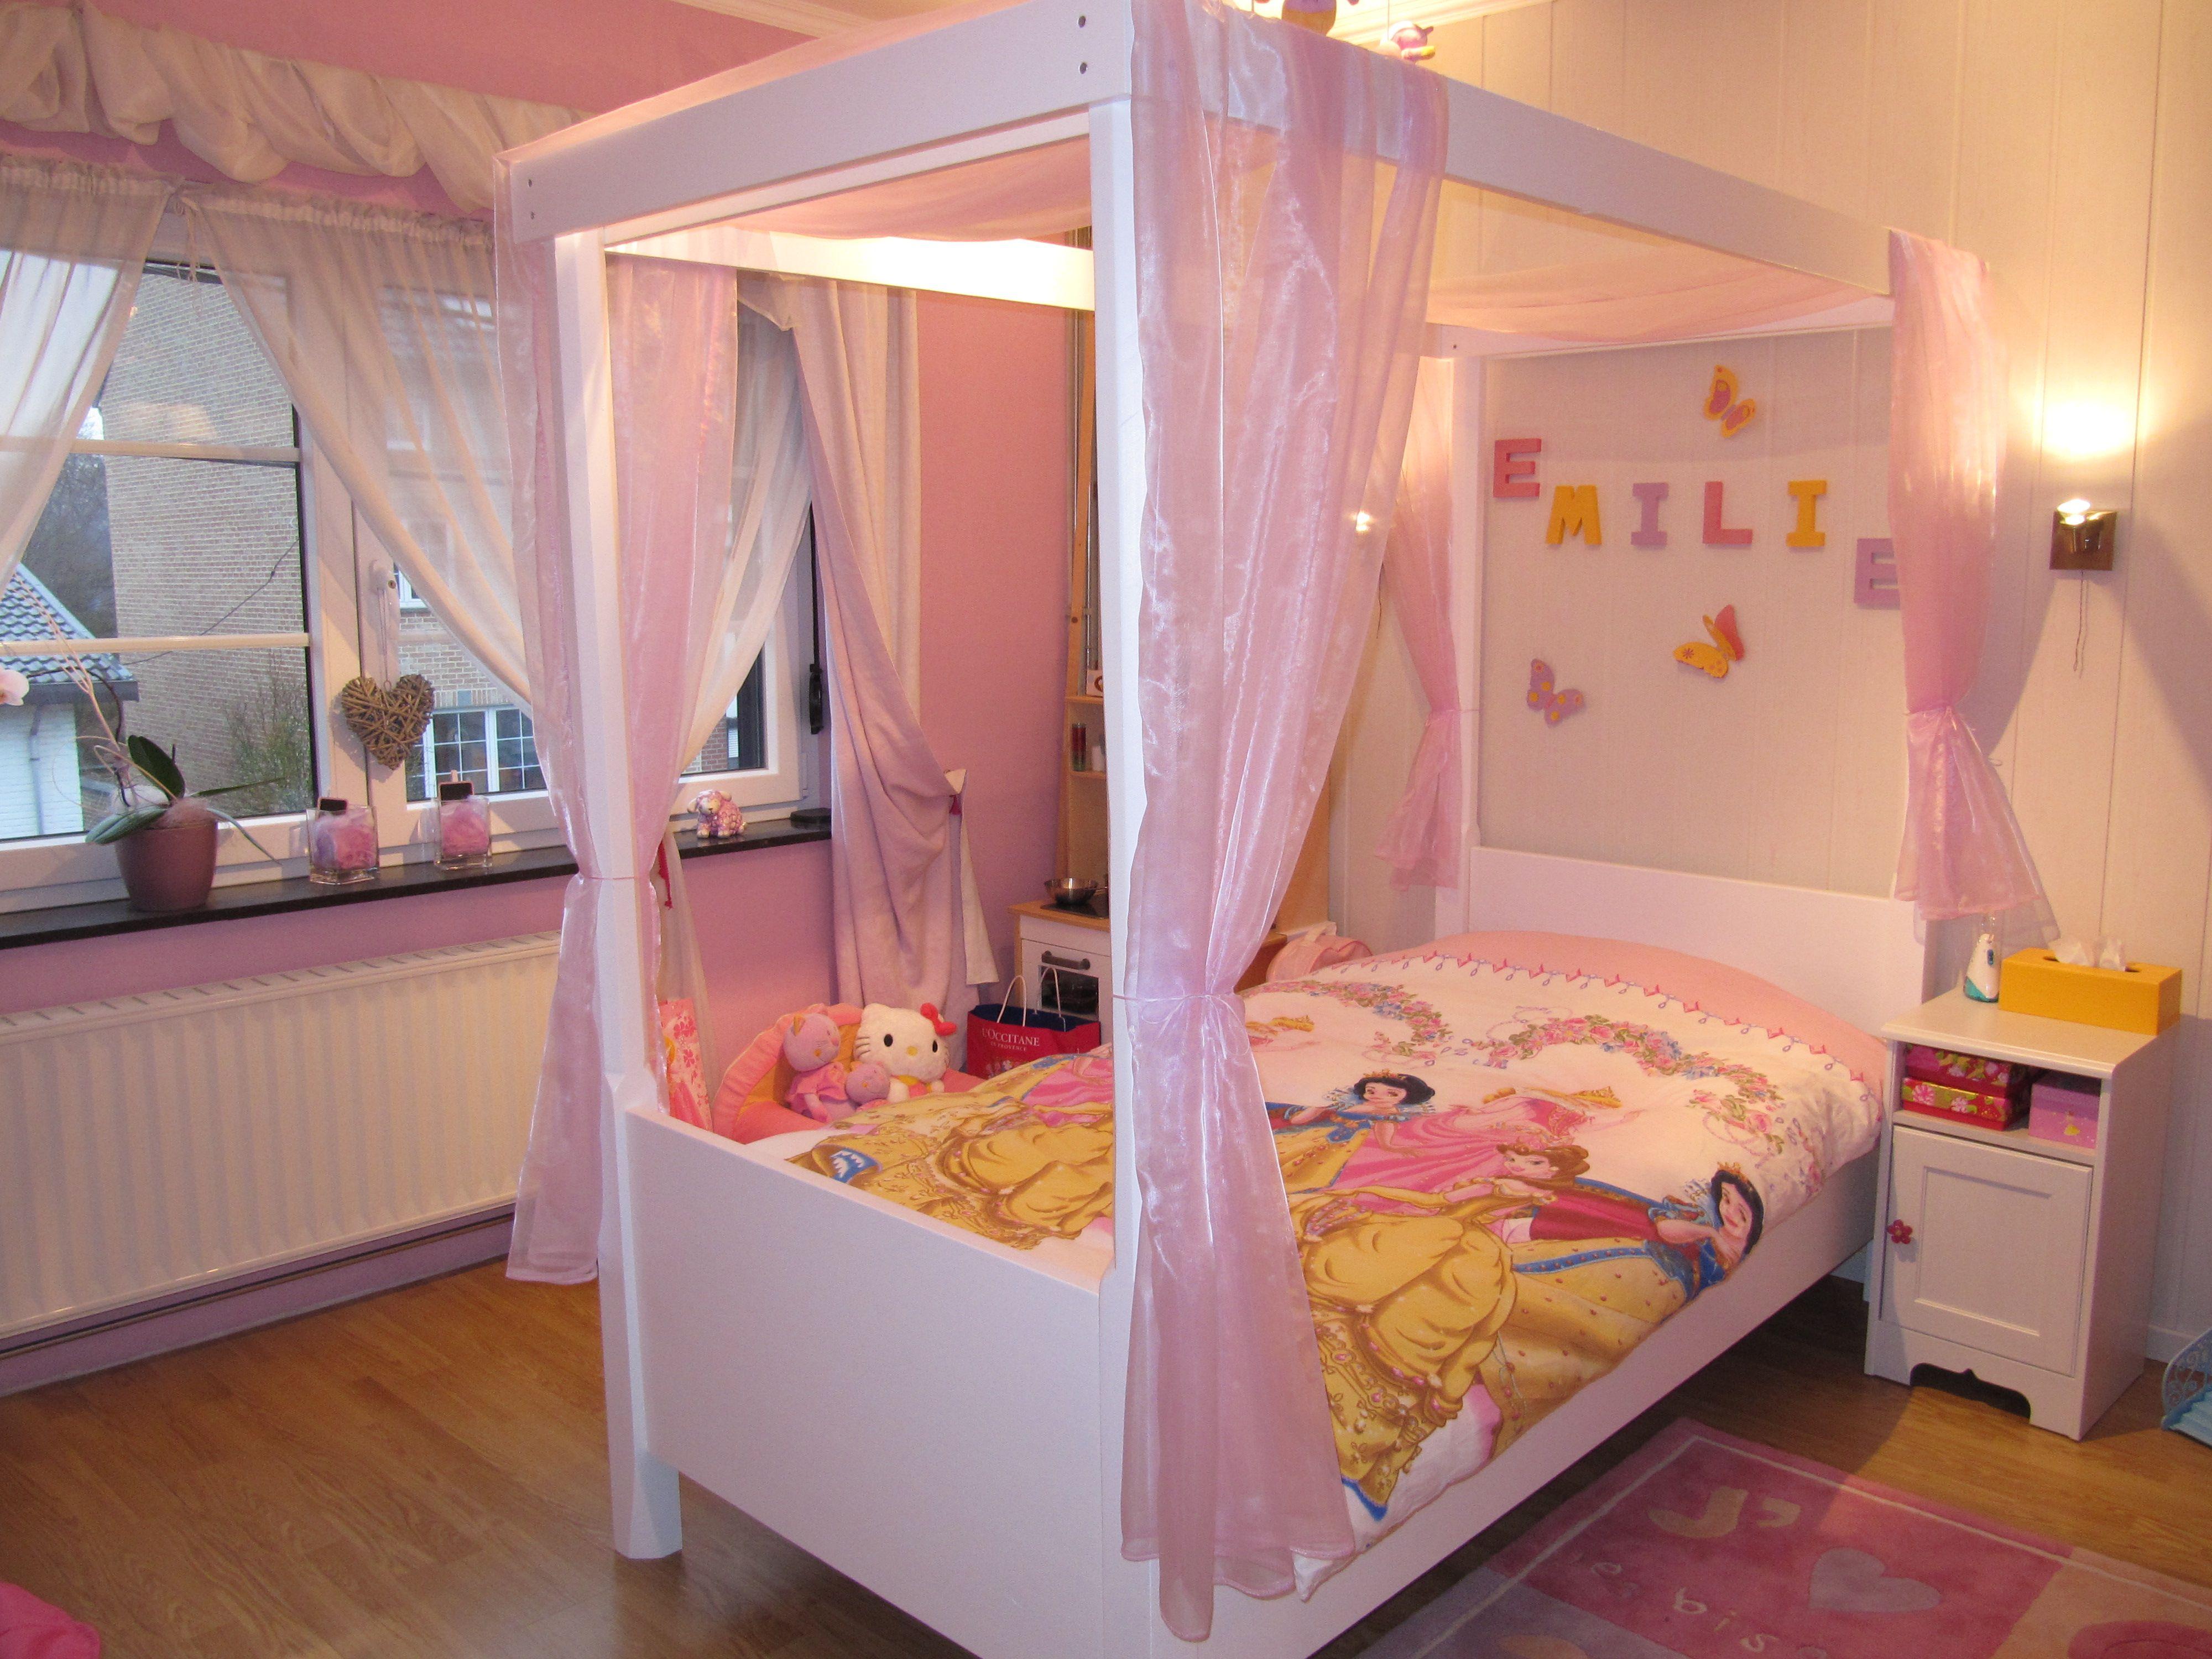 idee deco chambre fille 6 ans id 233 es d 233 coration | Minouette ...